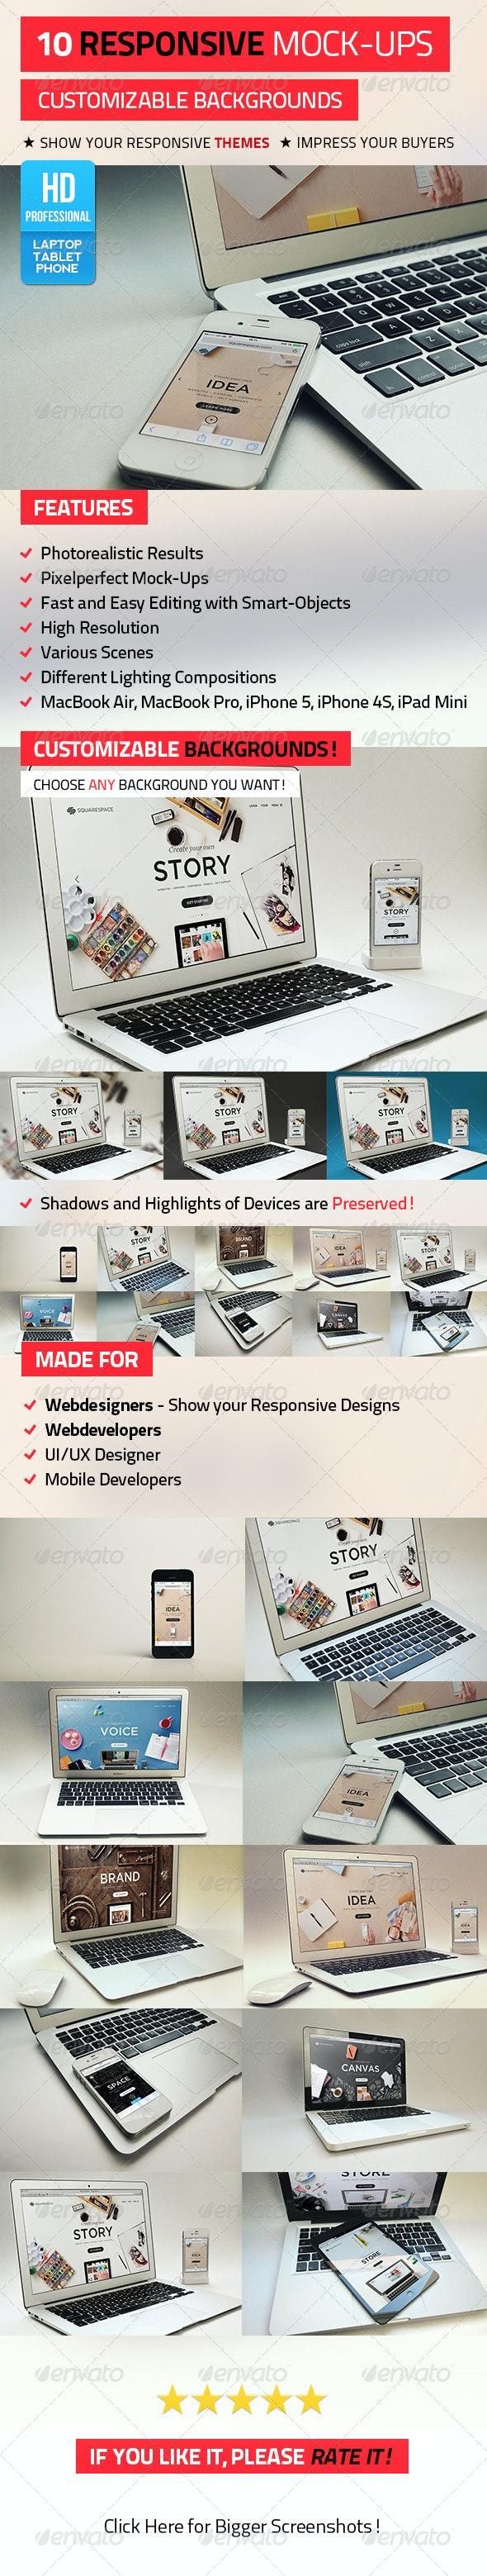 10 Responsive Mock-Ups - Displays Product Mock-Ups